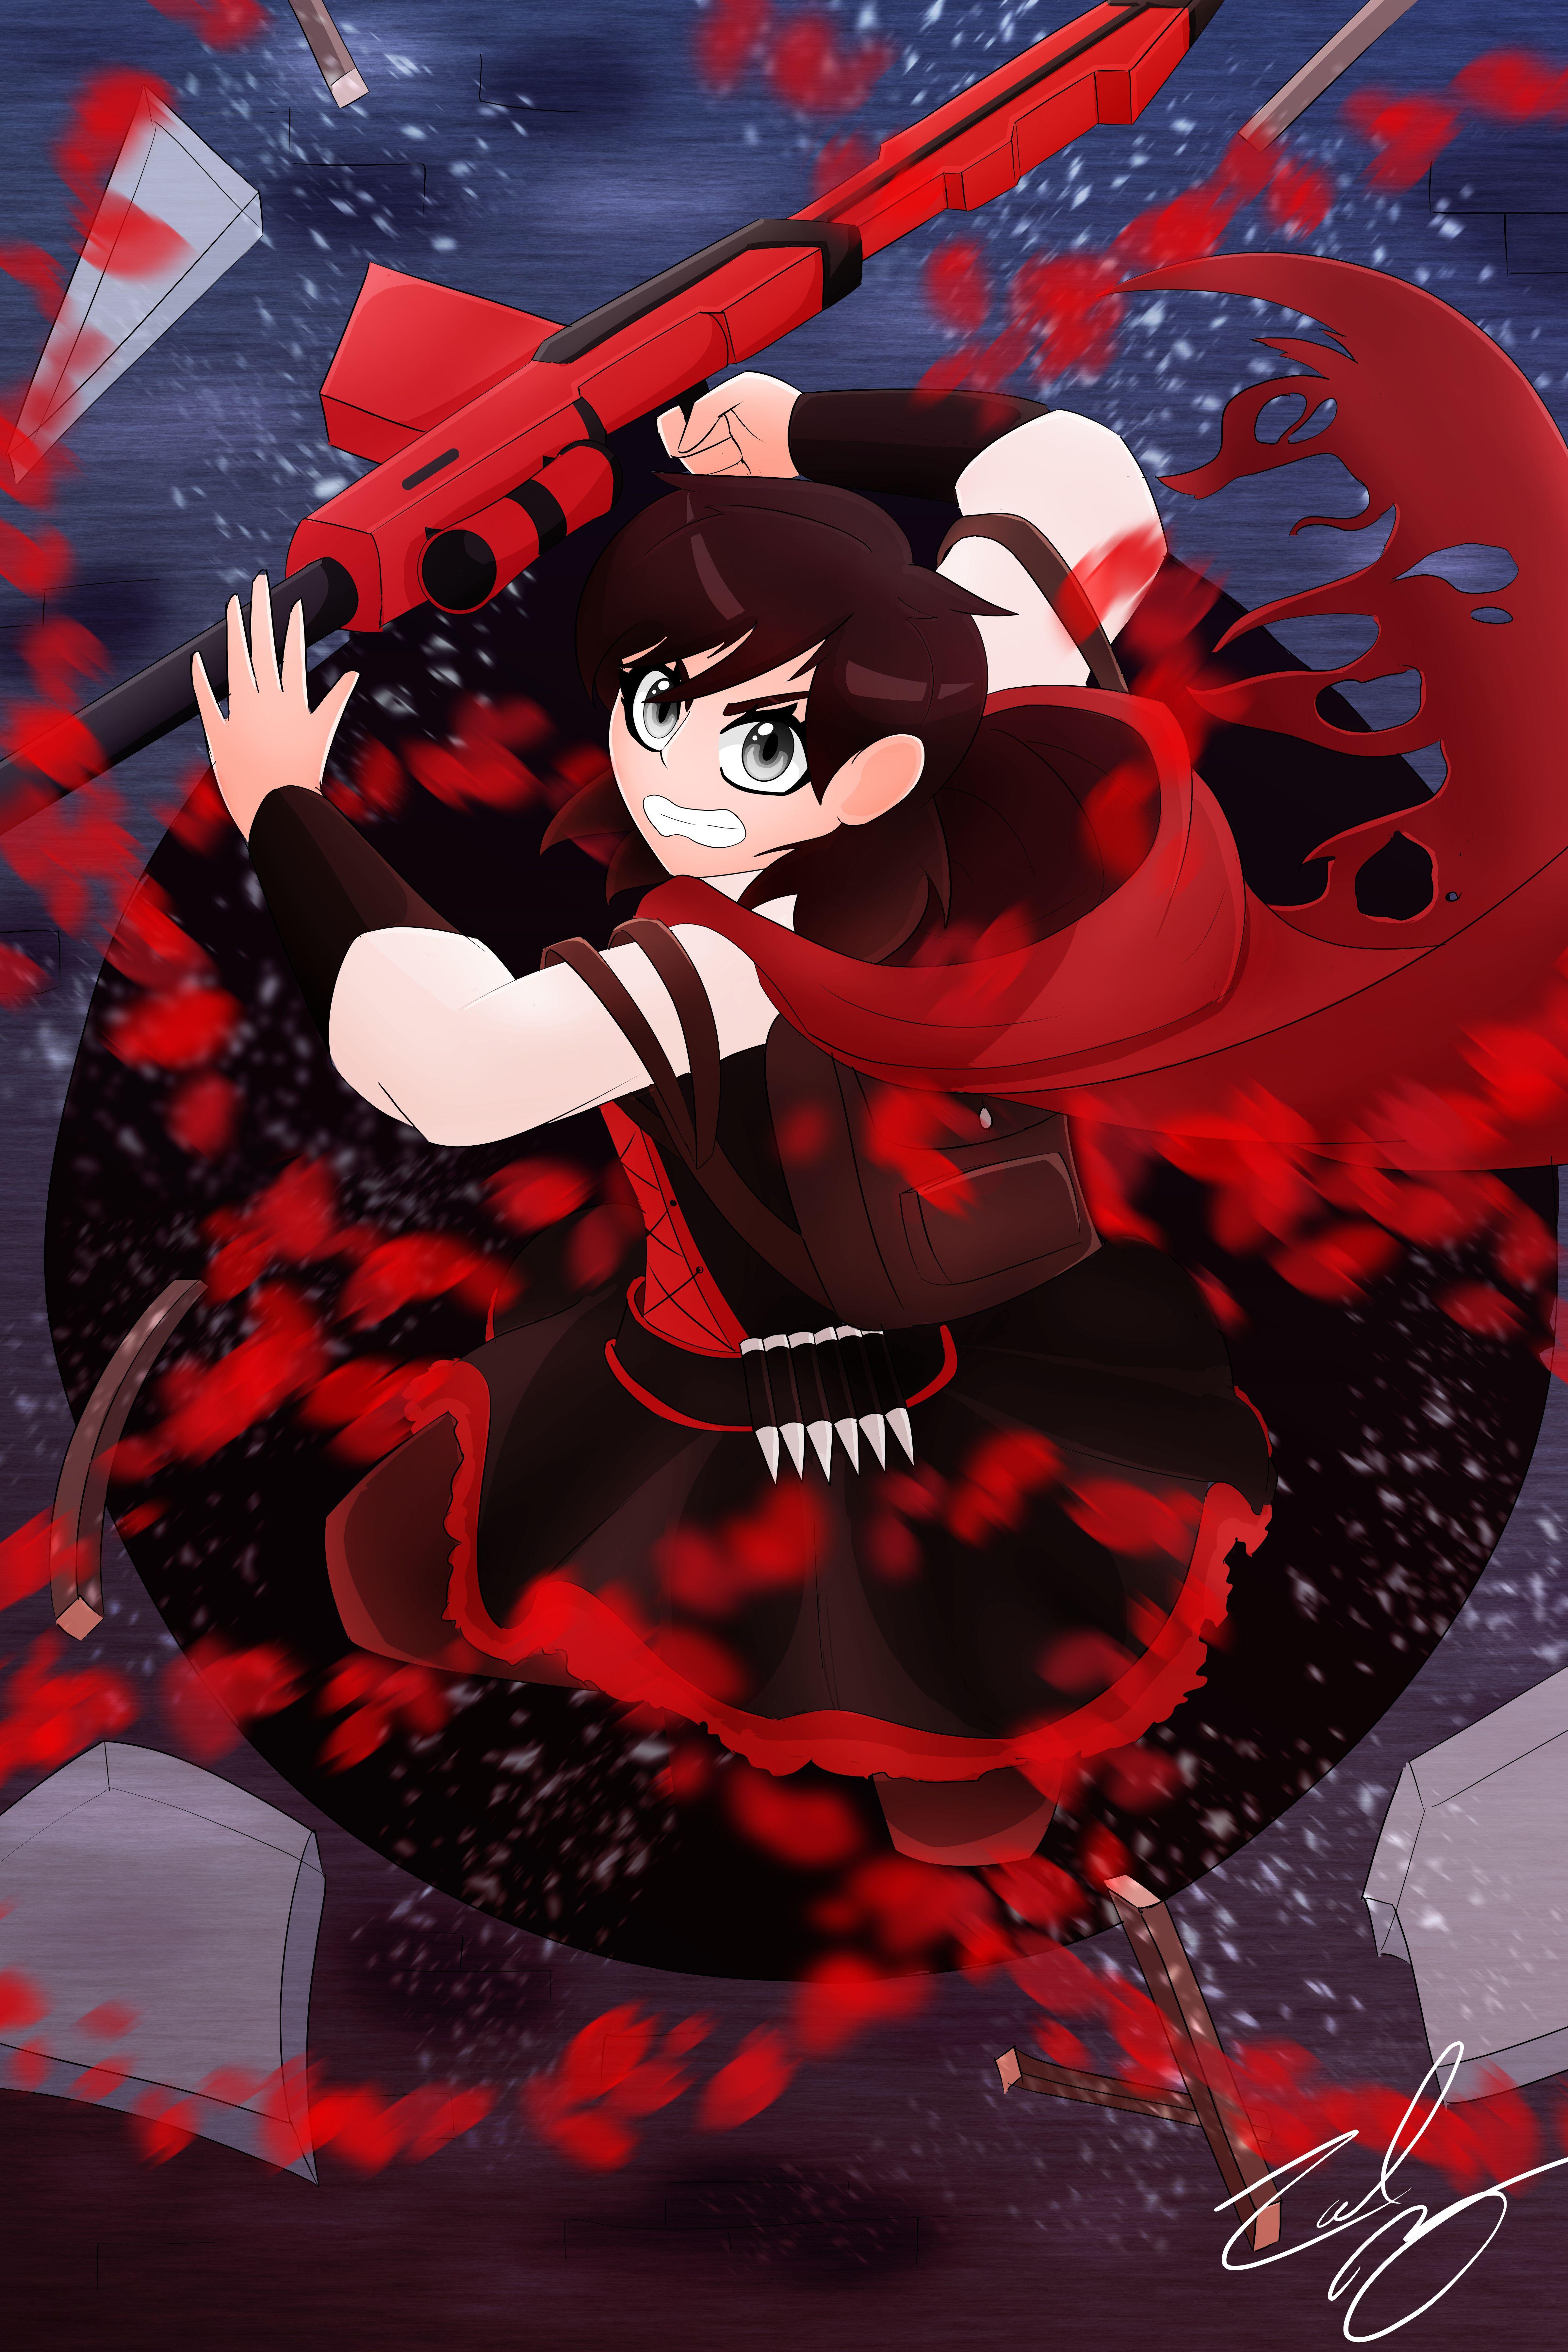 Pin by JY Choo on RWBY Ruby | Anime, Rwby, Rwby anime